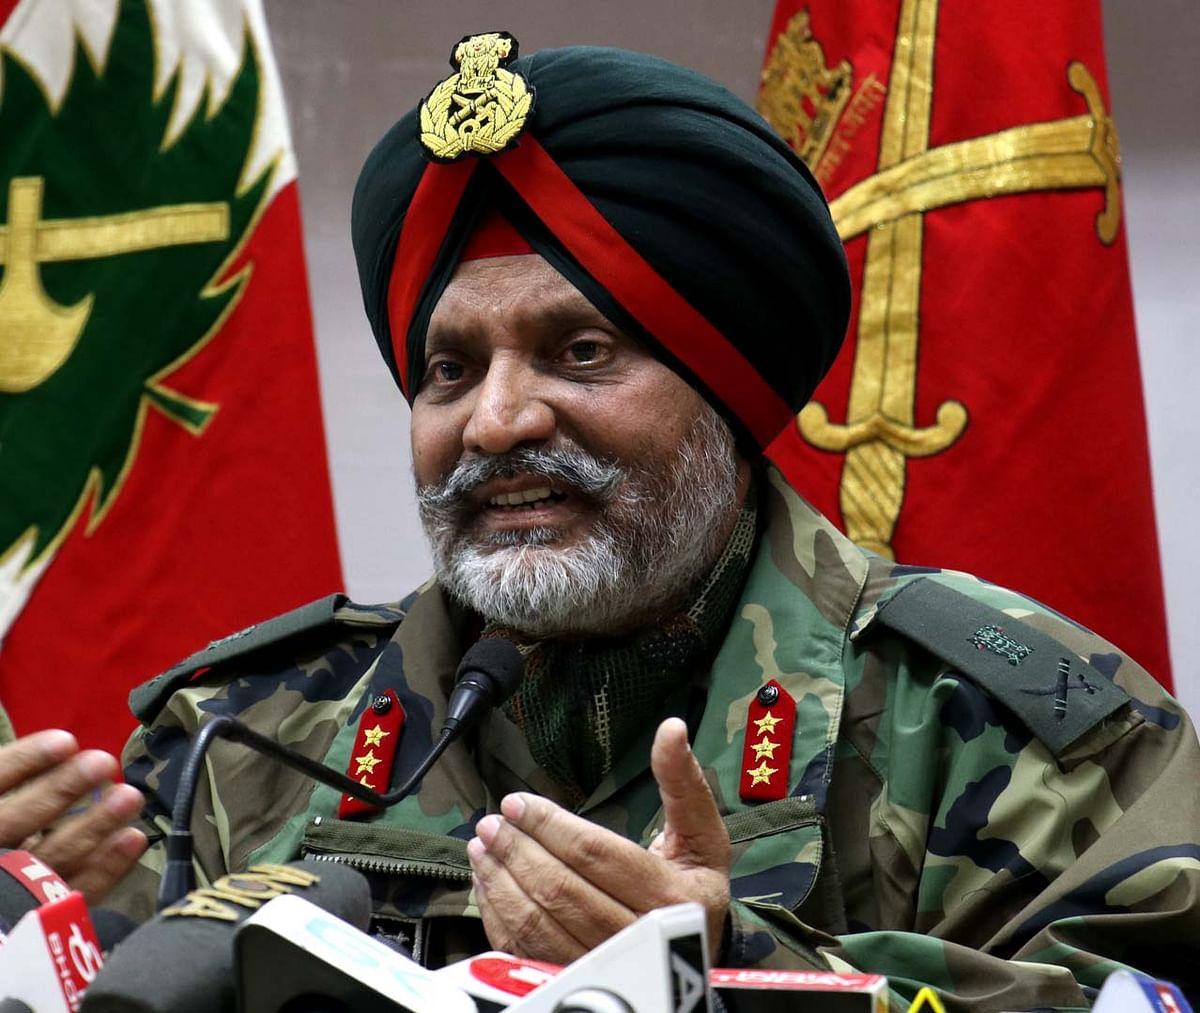 New JAKLI recruits will make Kashmir proud: GoC Dhillon